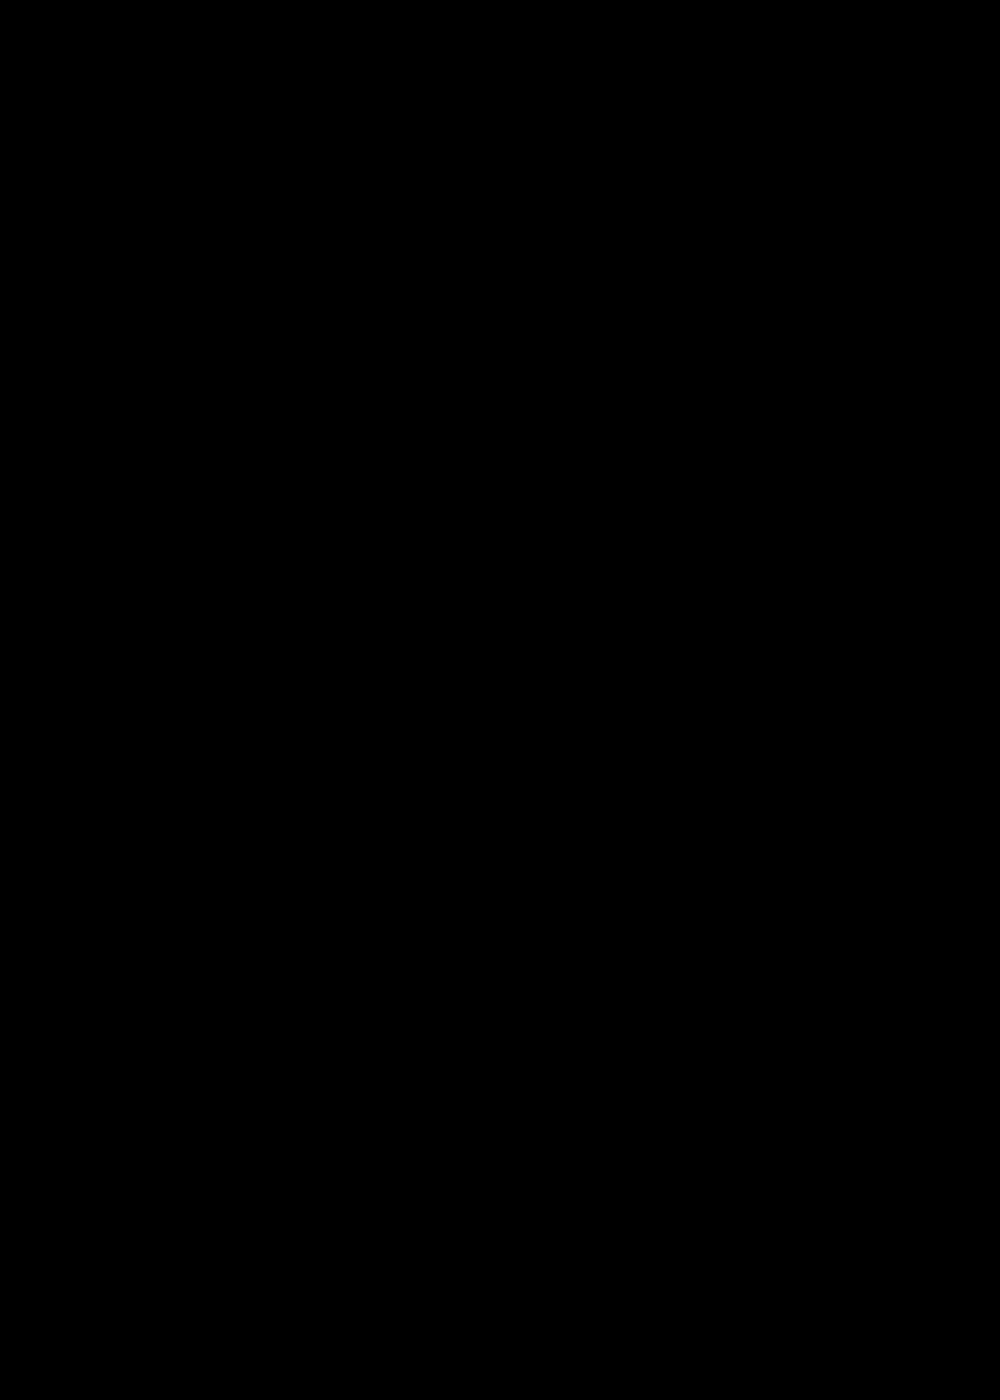 Hrekkjavaka Miðbergs 2019